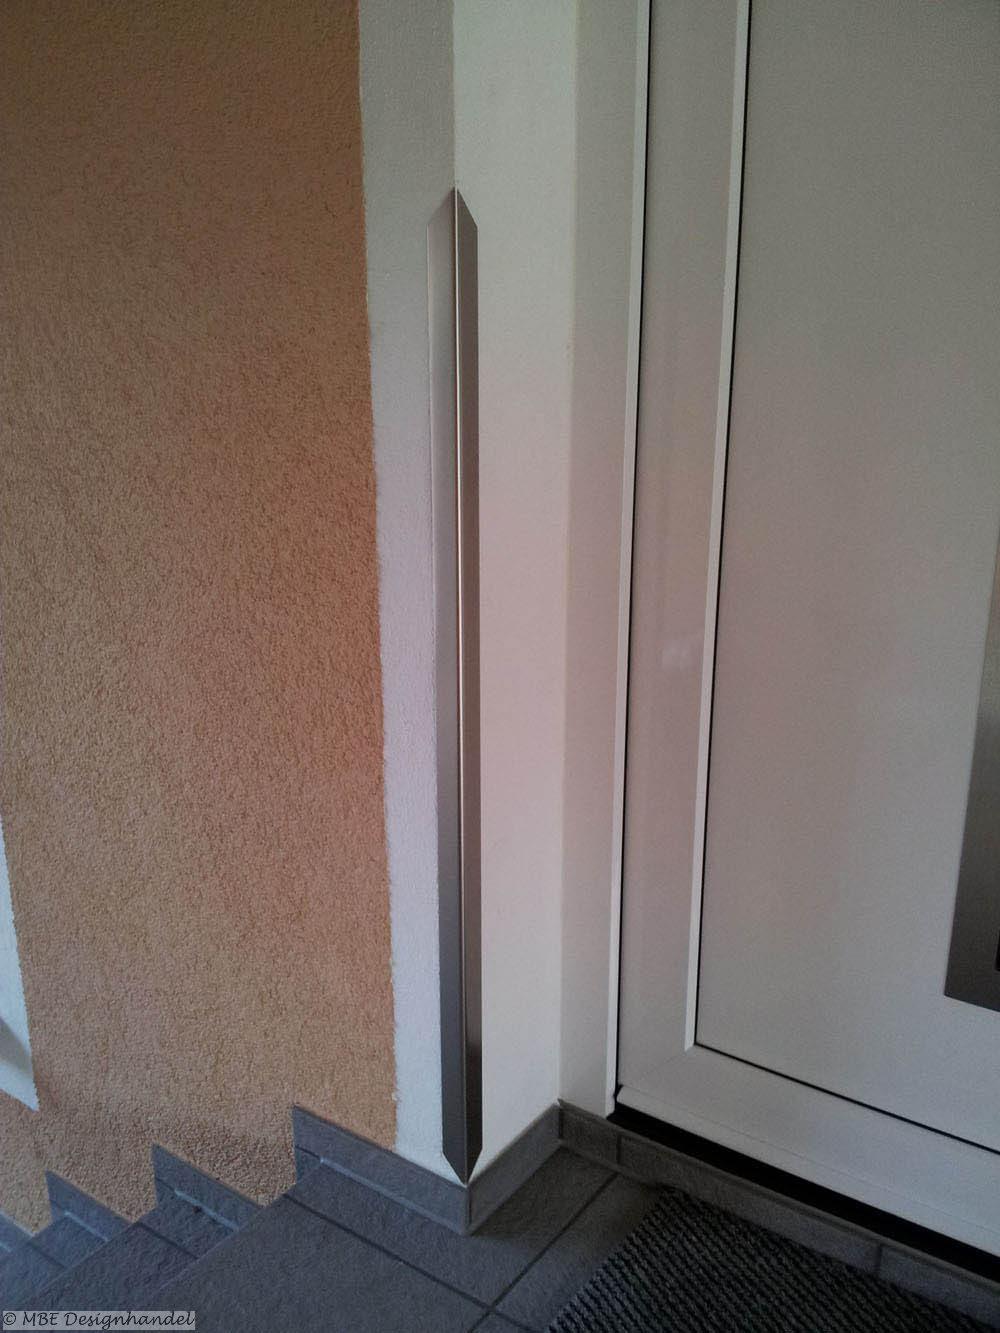 edelstahl kantenschutz mit spitze 60x60x1500mm 1mm stark. Black Bedroom Furniture Sets. Home Design Ideas